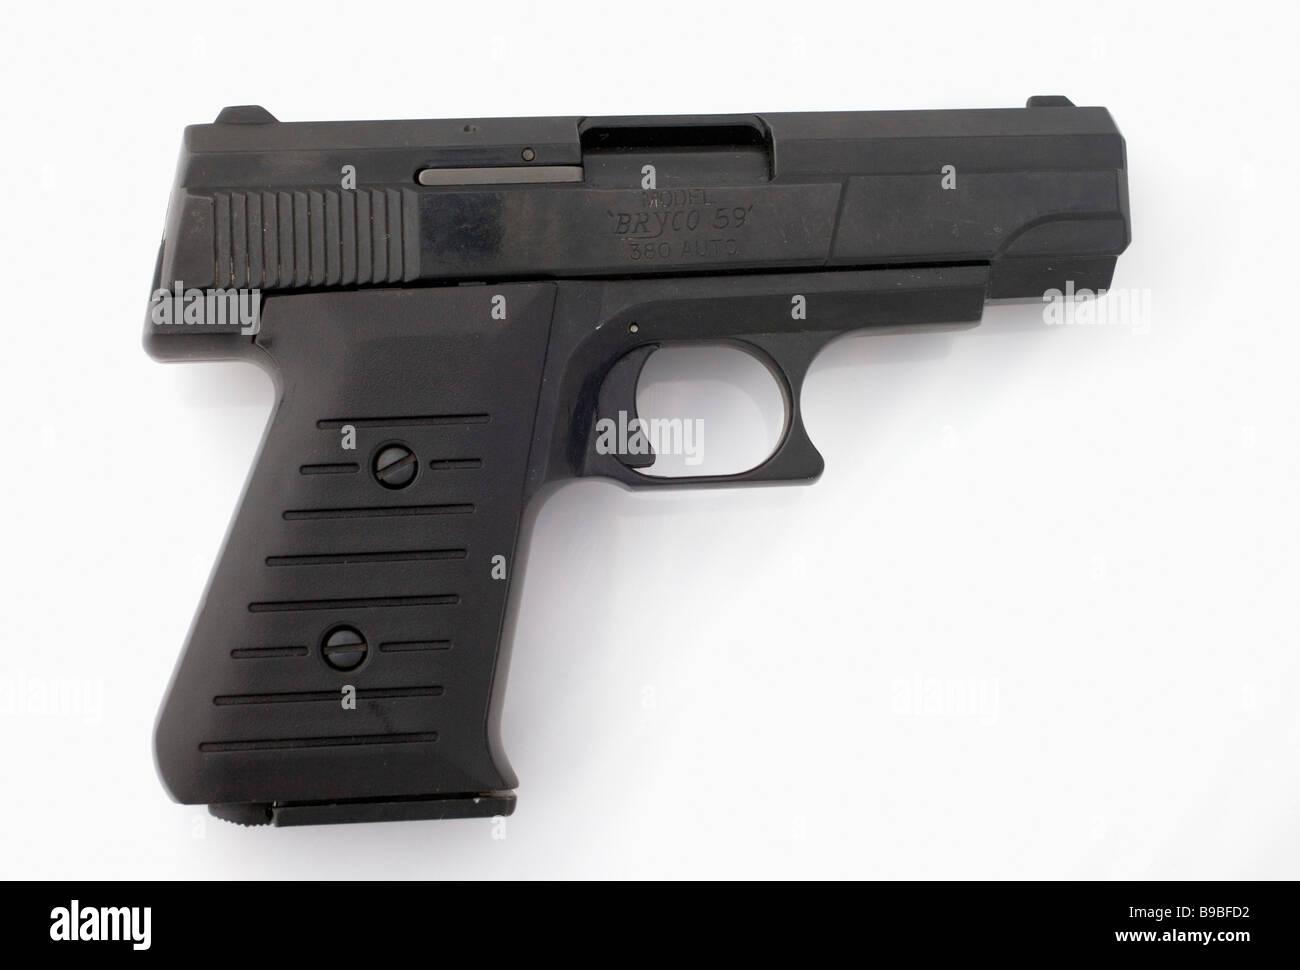 Samstag Nacht Special Pistole. Stockbild